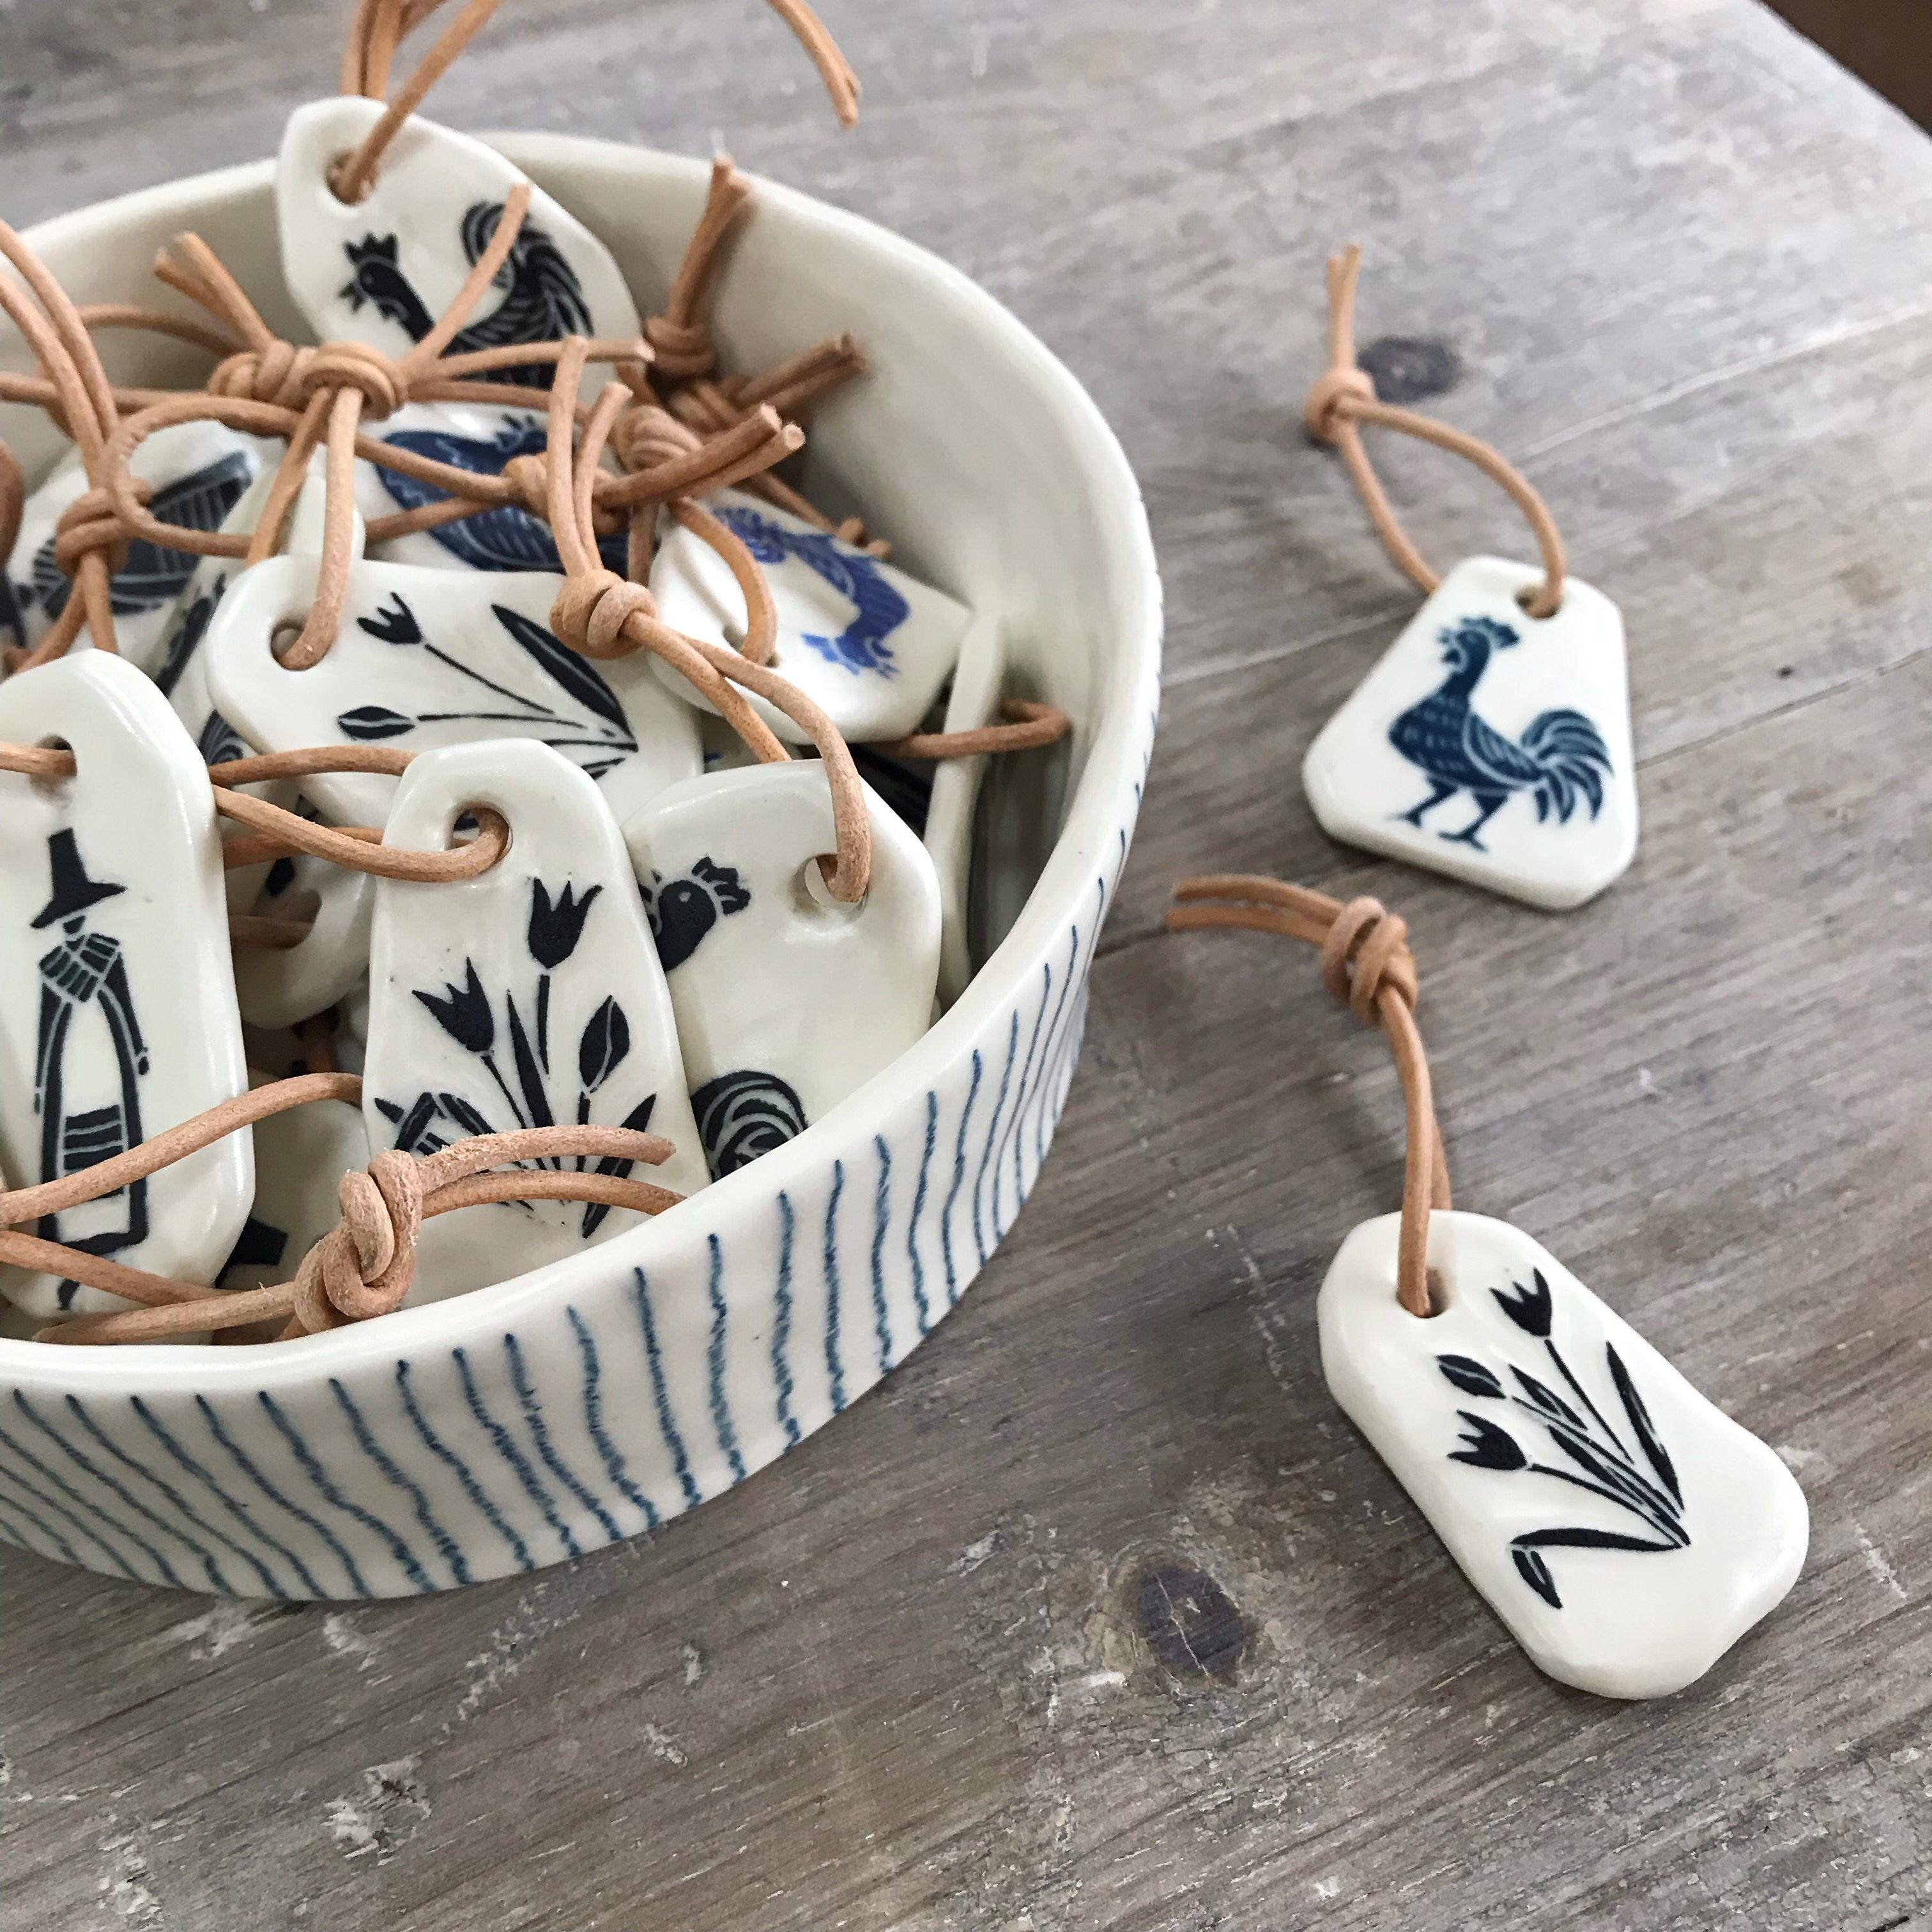 Skratch Ceramics | Ceramic Key-rings #ceramicpottery